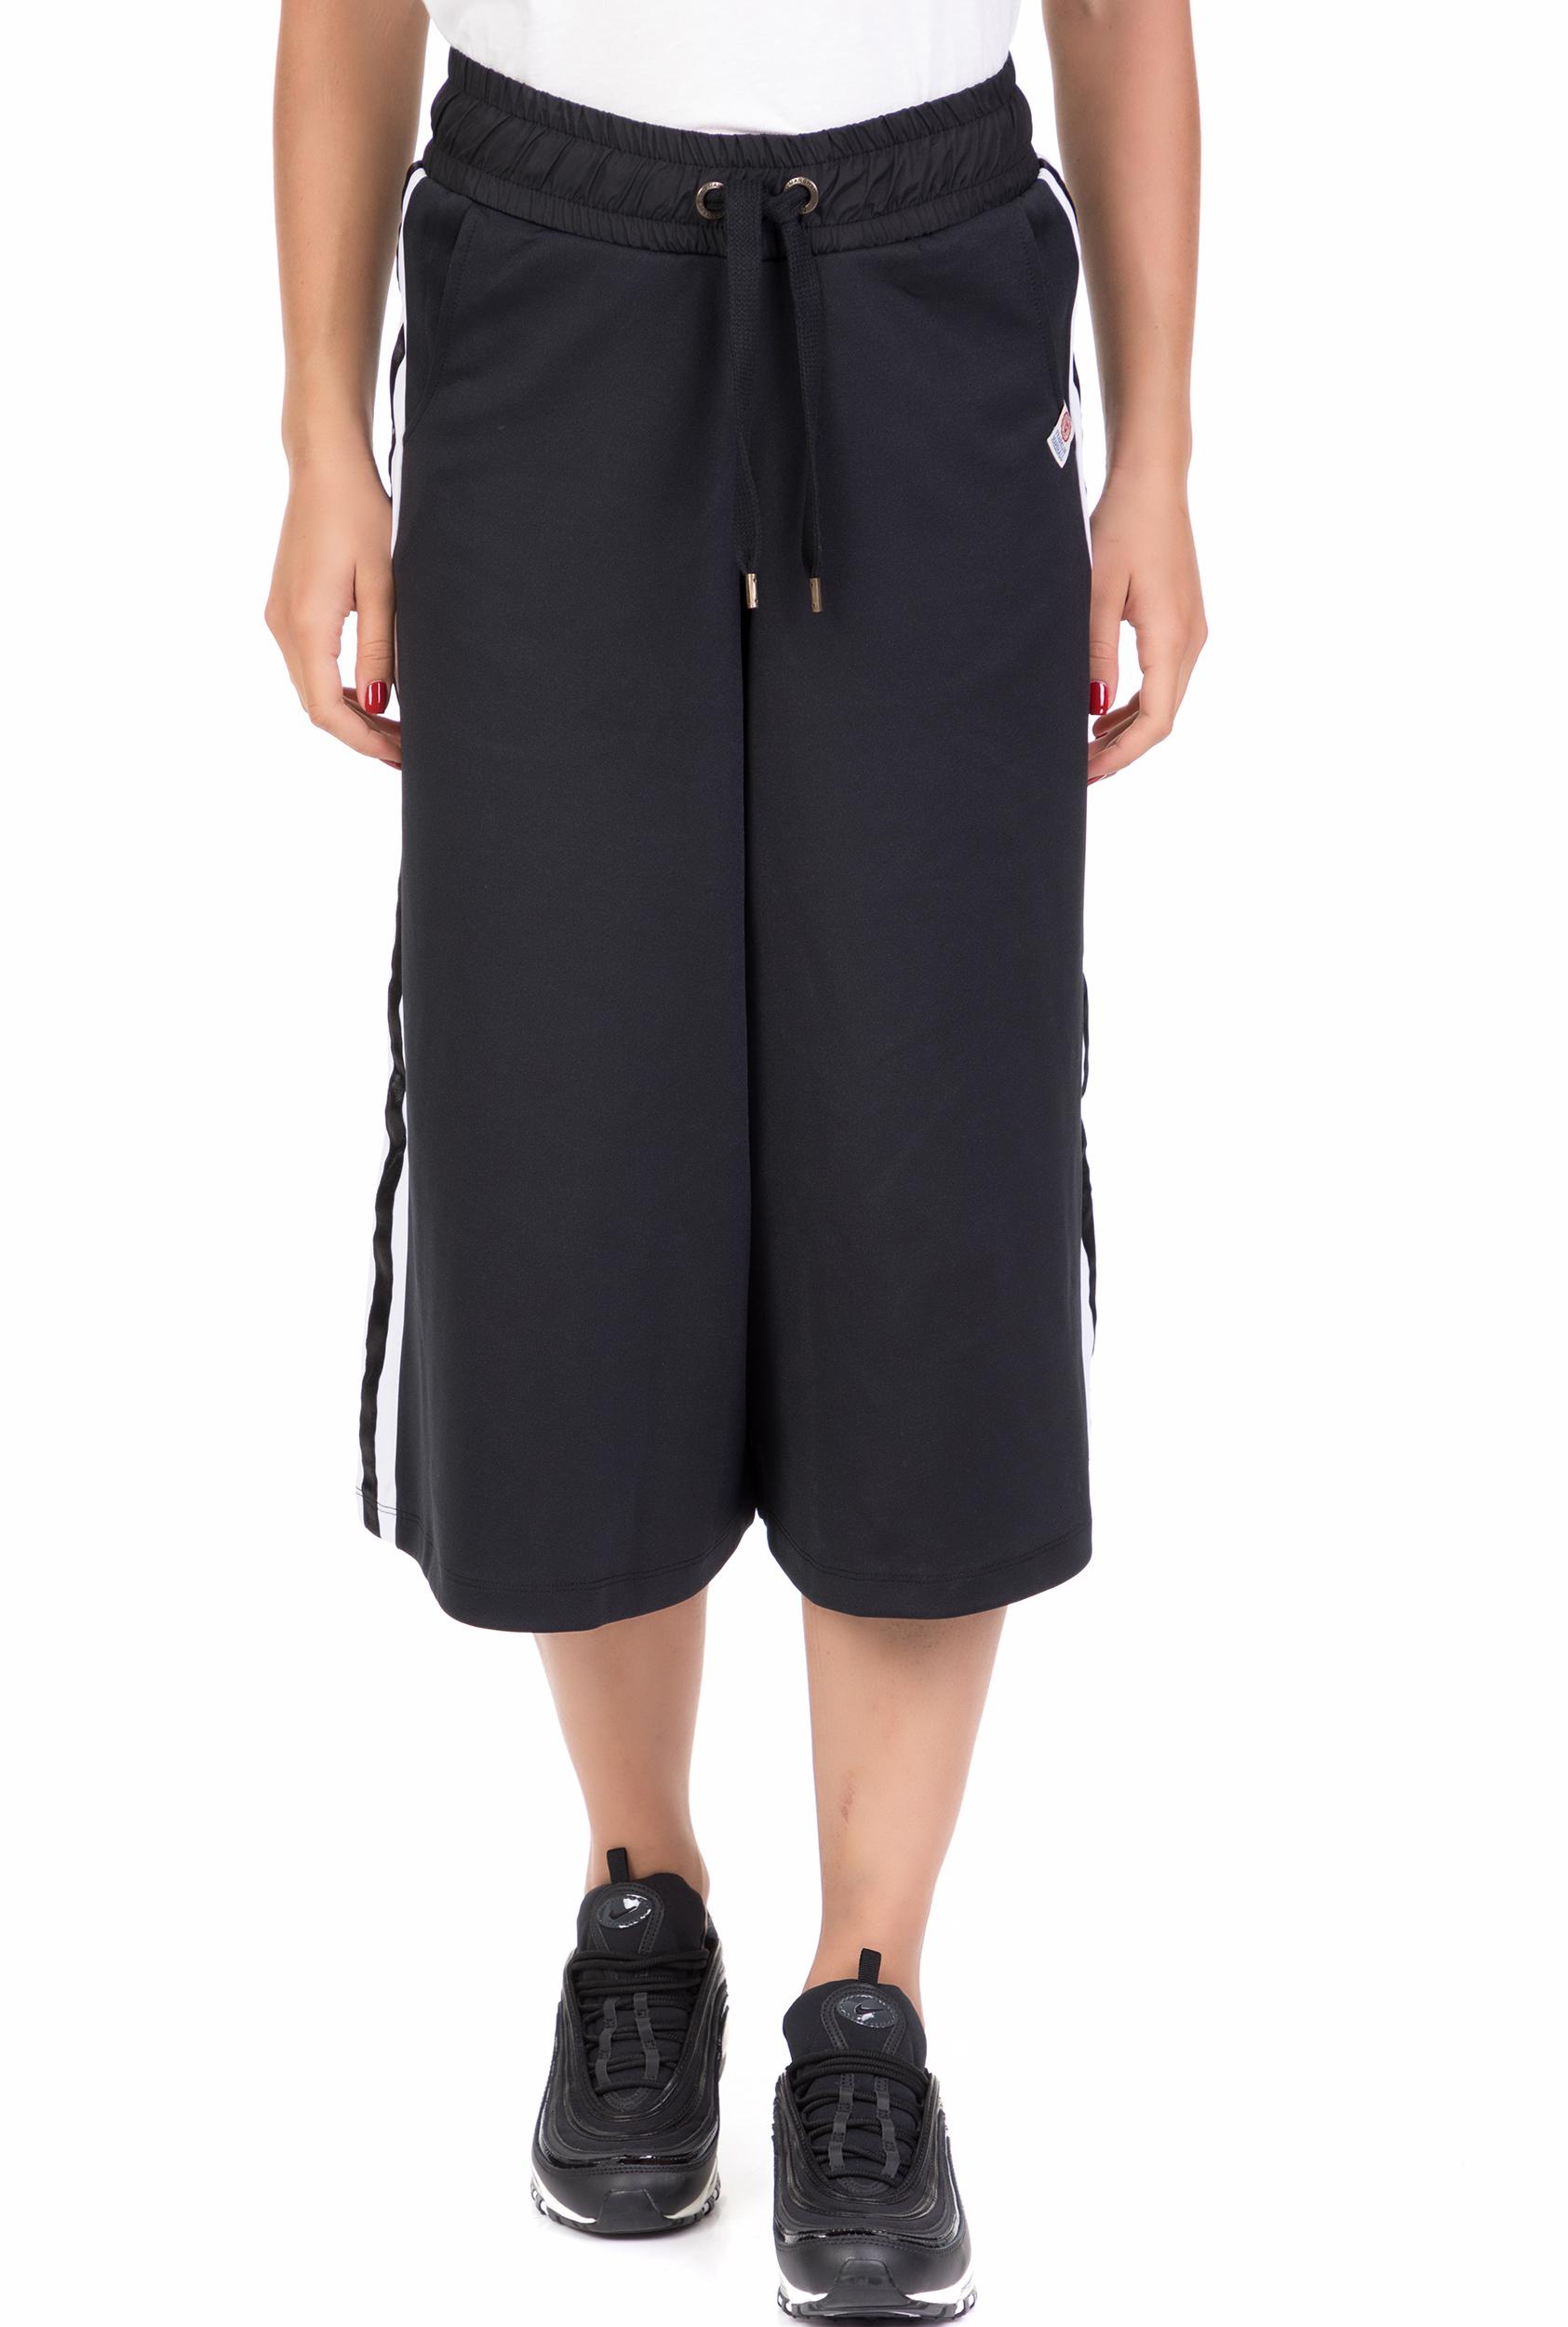 50c5981c34e LA DOLLS - Γυναικεία παντελόνα La Dolls μαύρη - γκρι